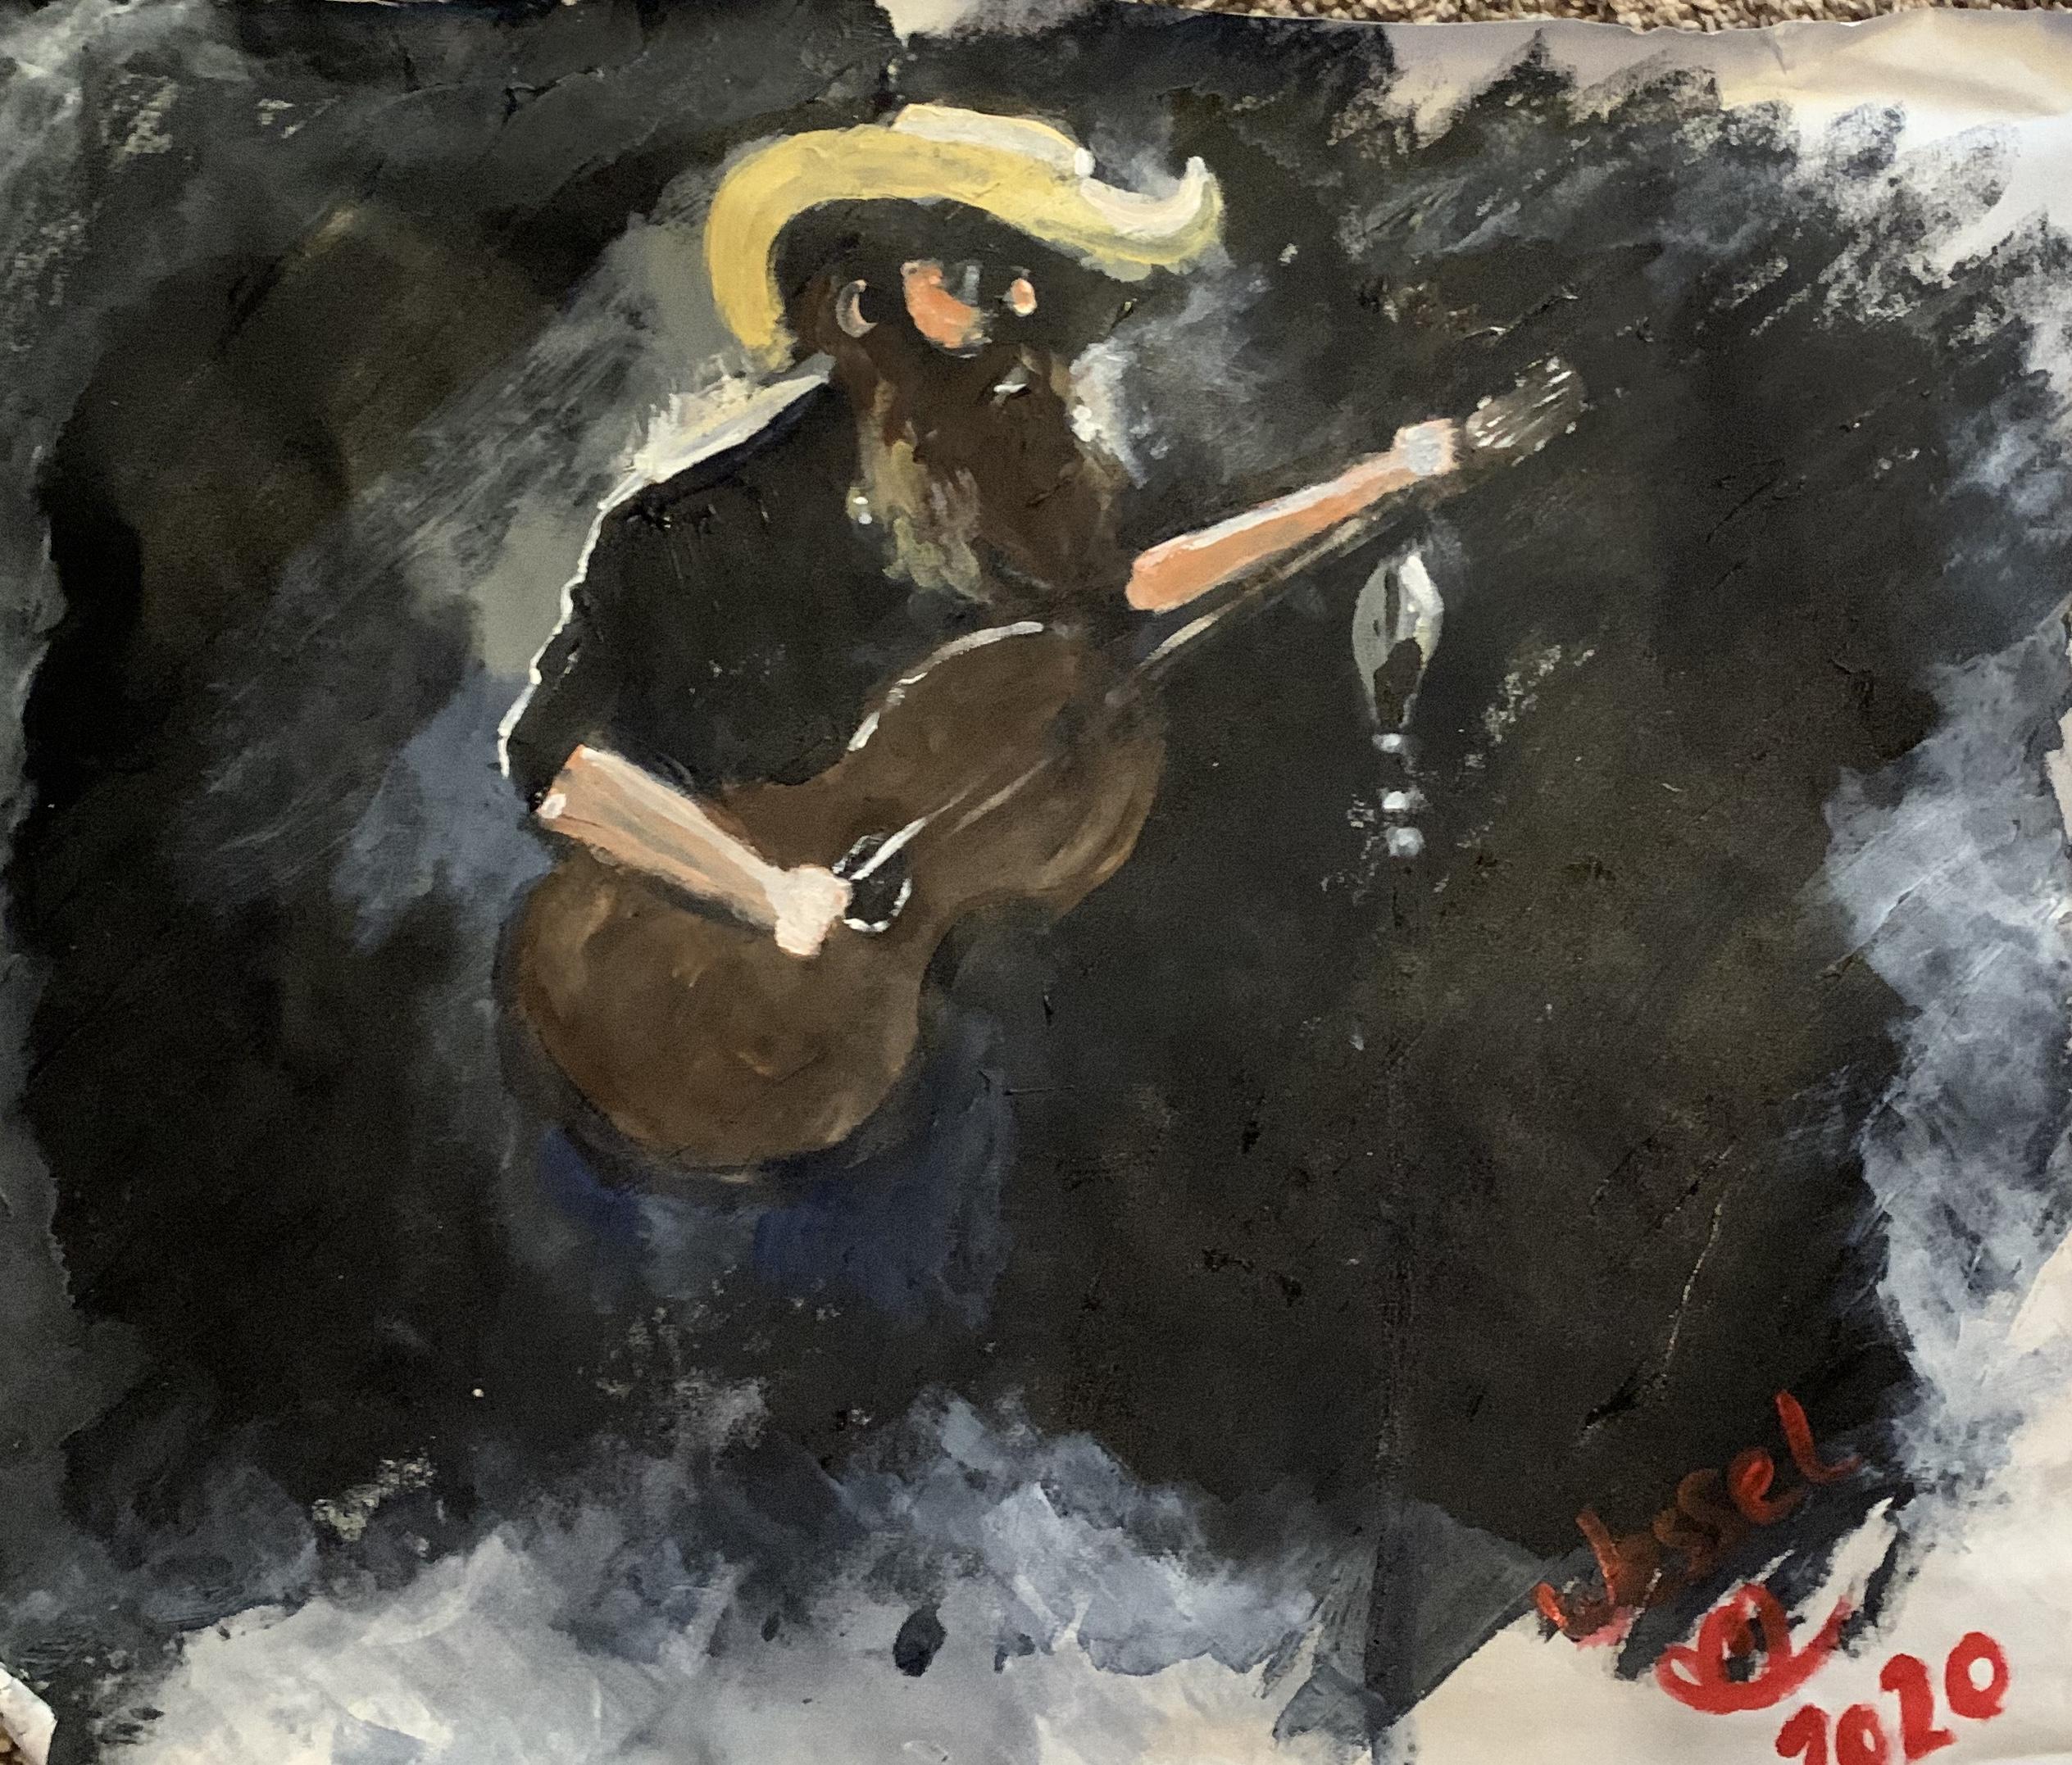 Chris Stapleton at Country Music Awards